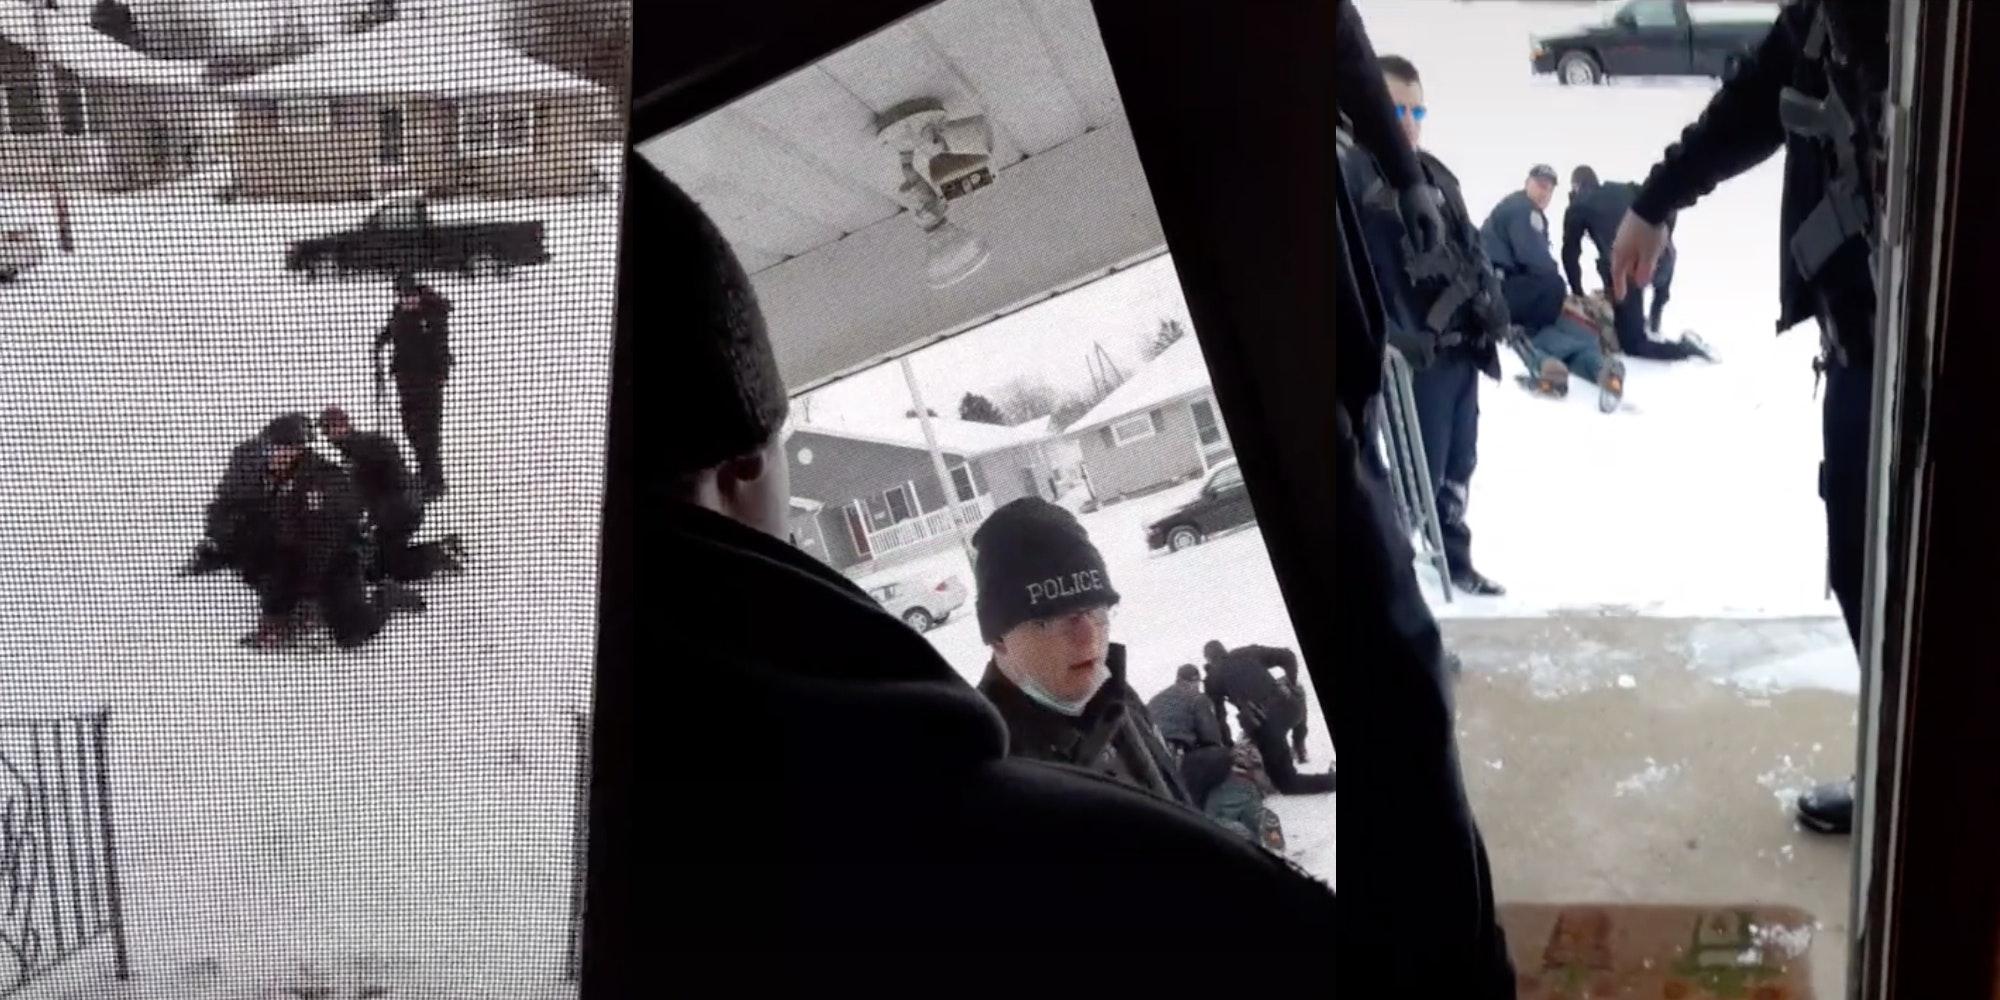 Five police officers arrest a single man - maskless